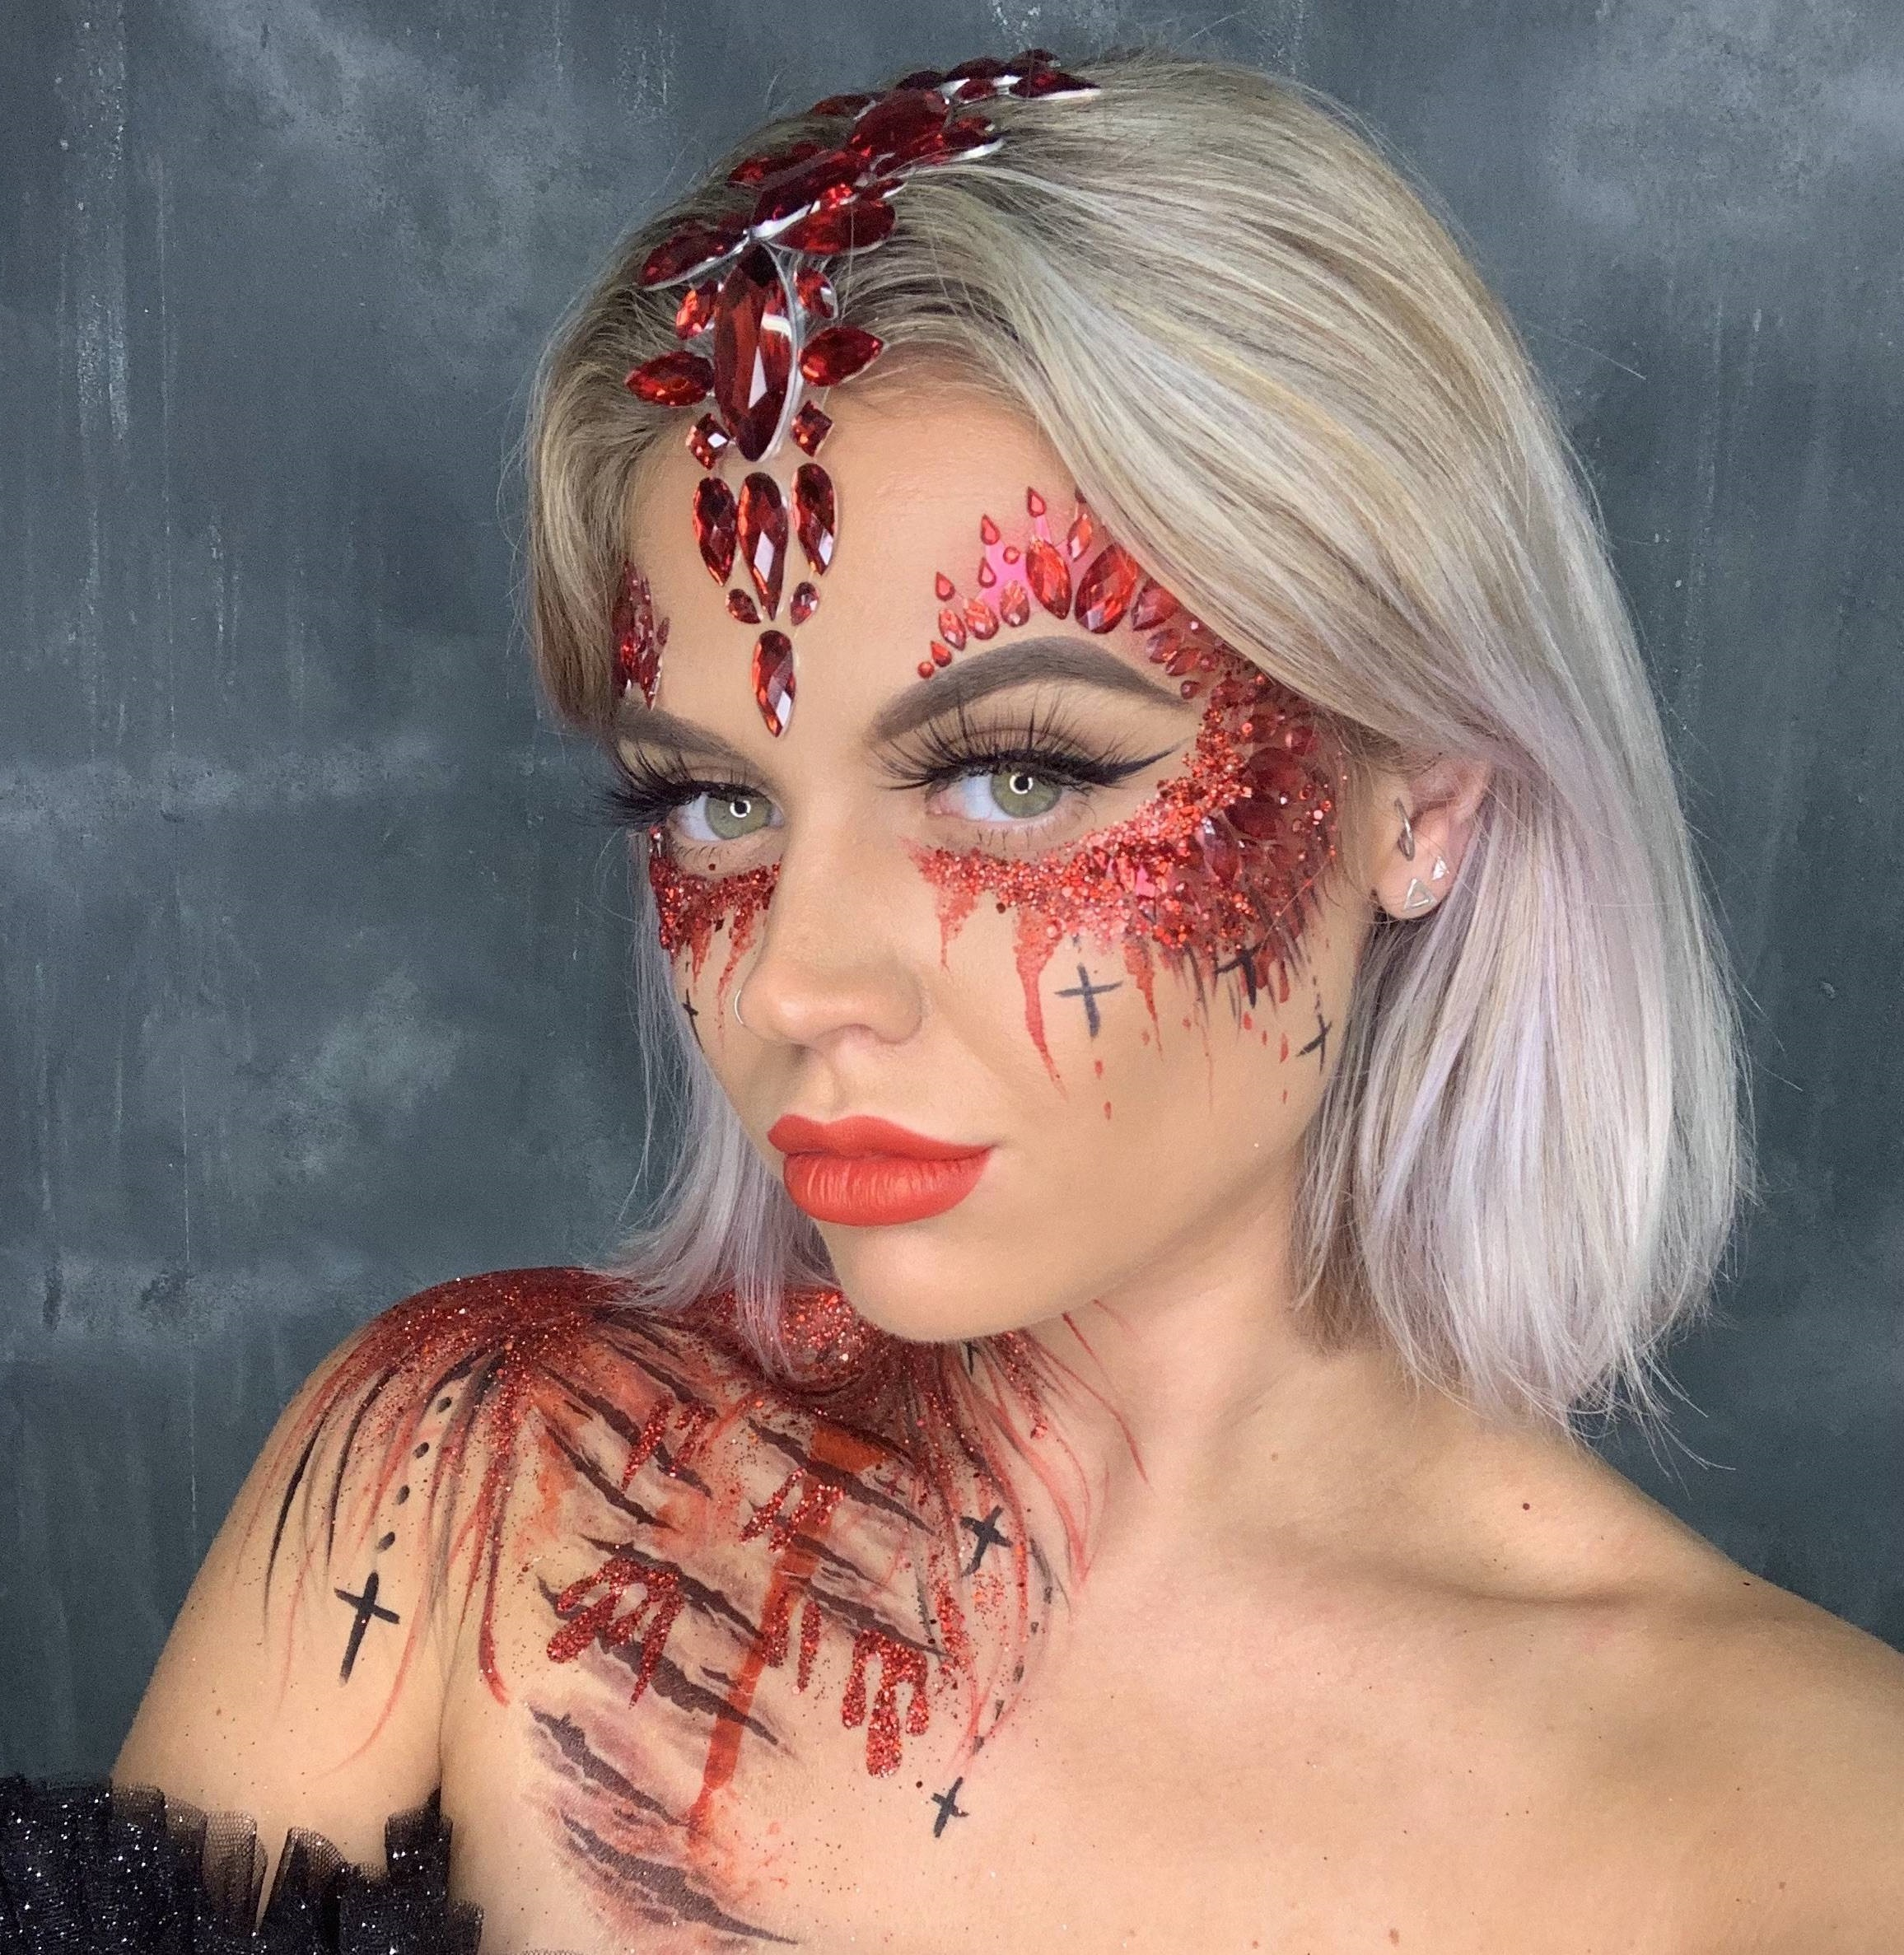 Déguisement d'Halloween créatif.